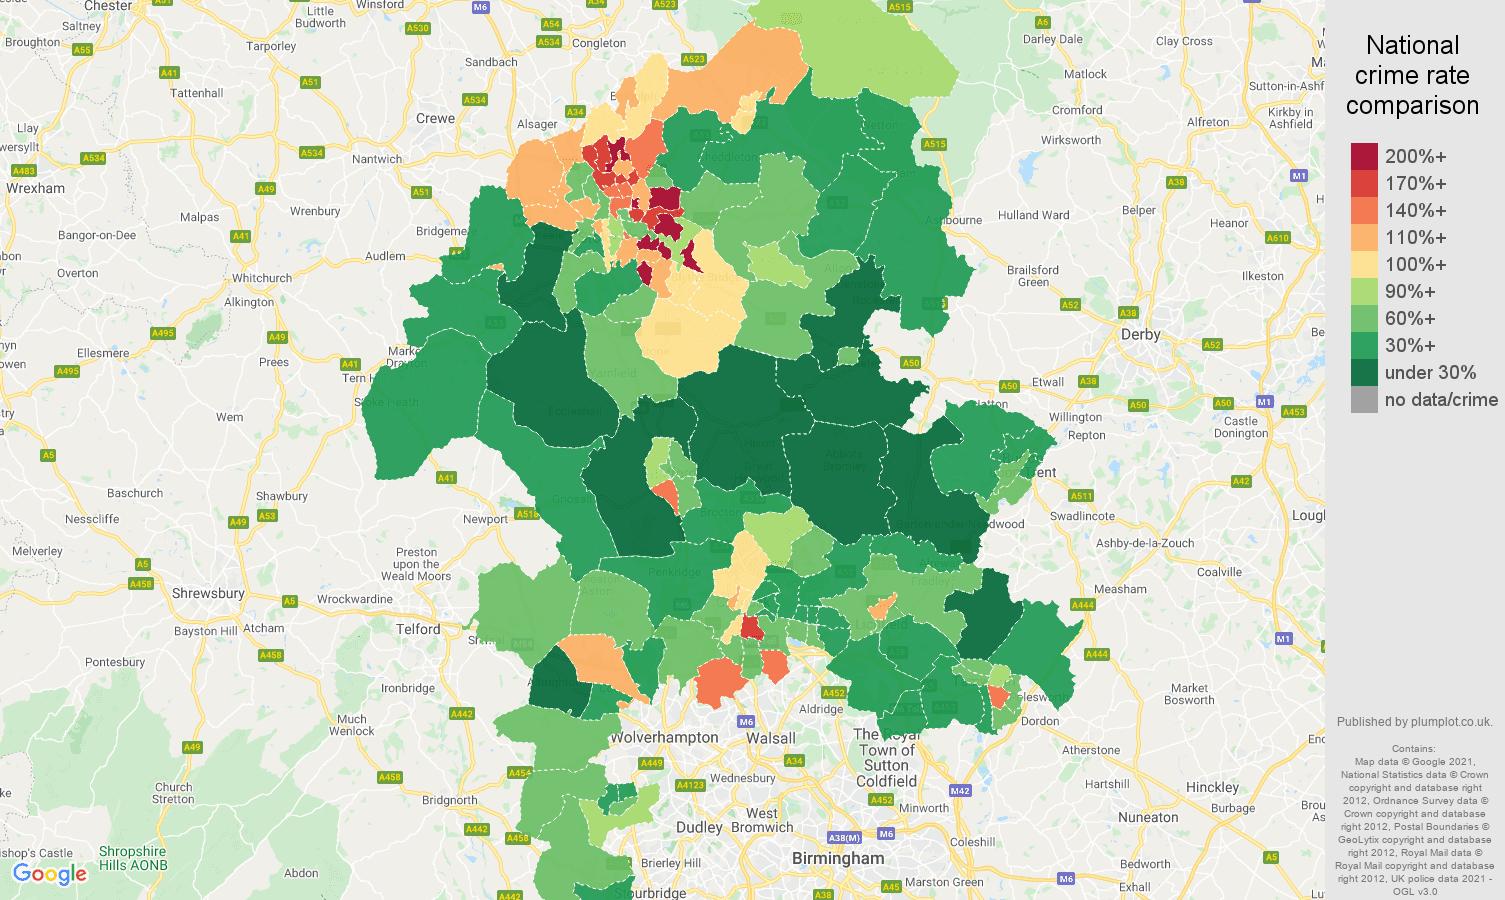 Staffordshire criminal damage and arson crime rate comparison map